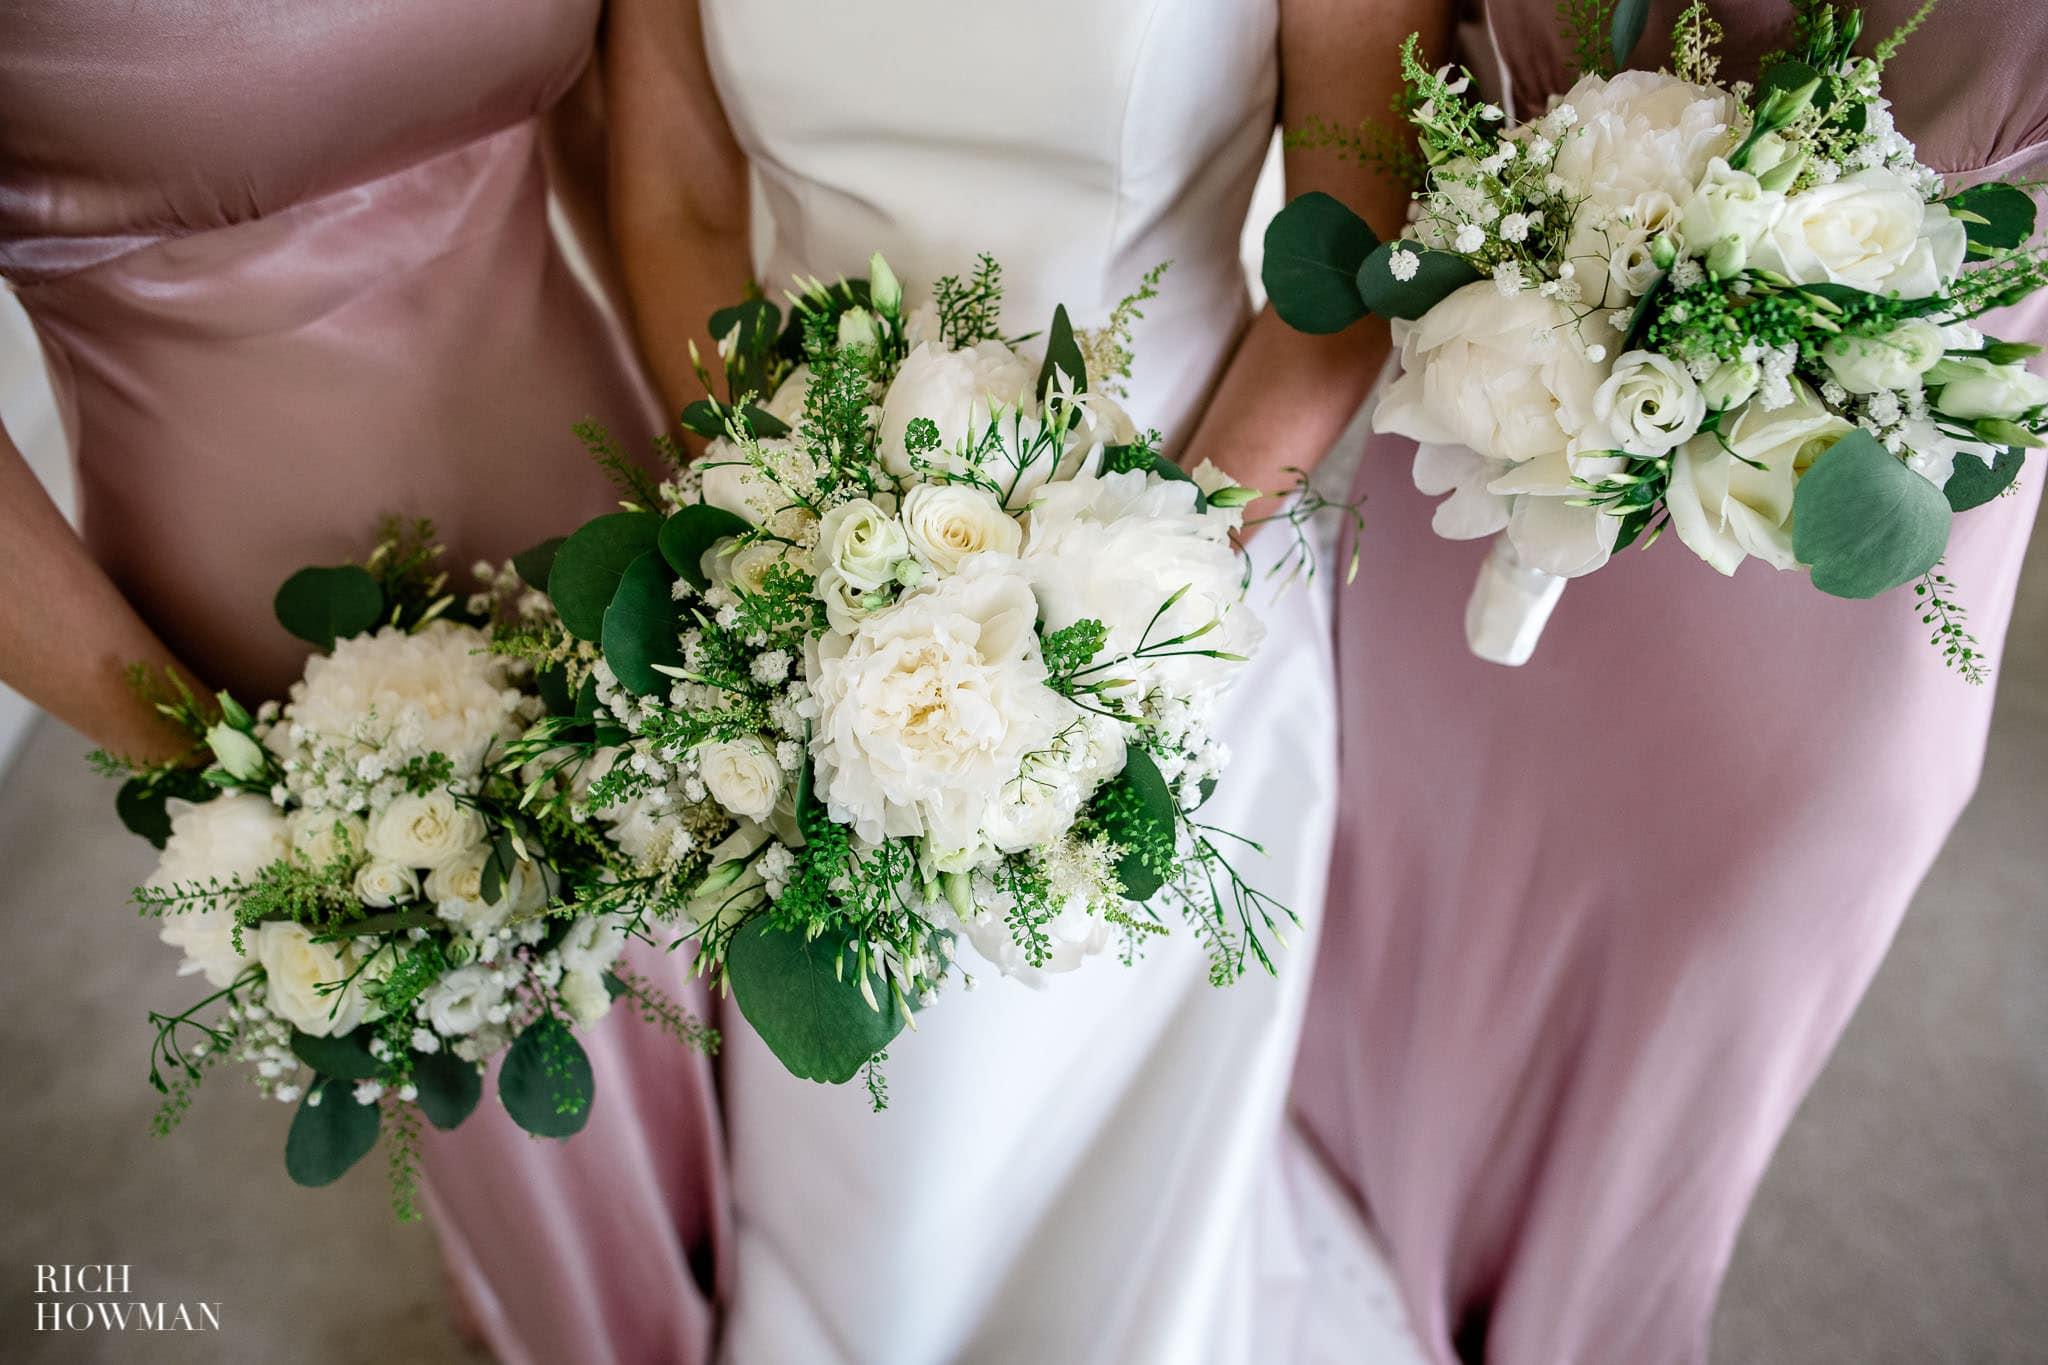 Hedsor House Wedding Photographer in Berkshire 24